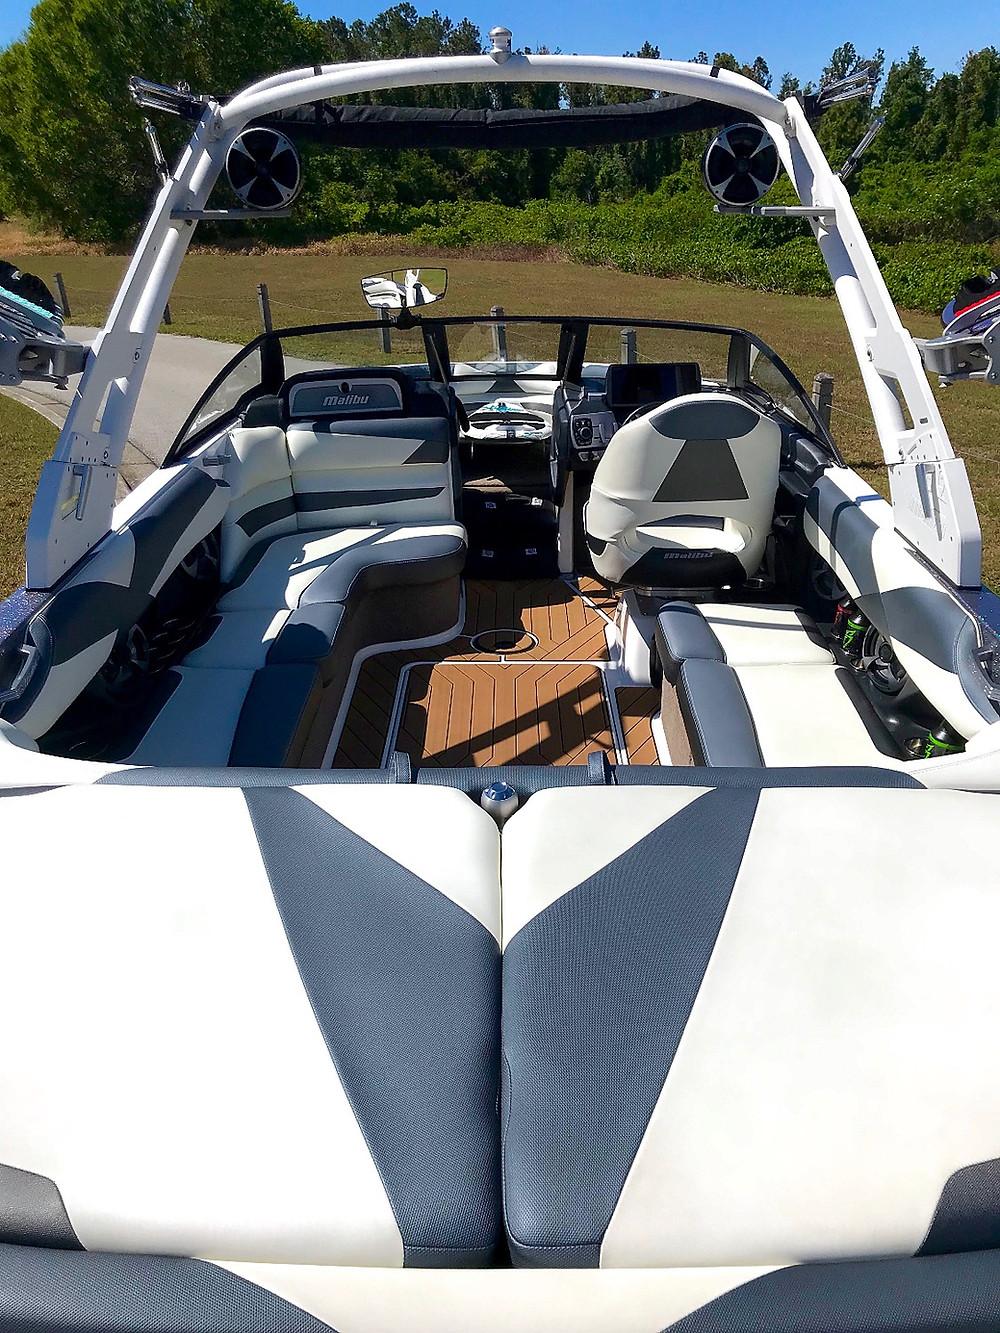 Wakesurf Orlando Malibu 23 LSV Wakesurf Boat Cleaned with Boat Bling Vinyl Sauce